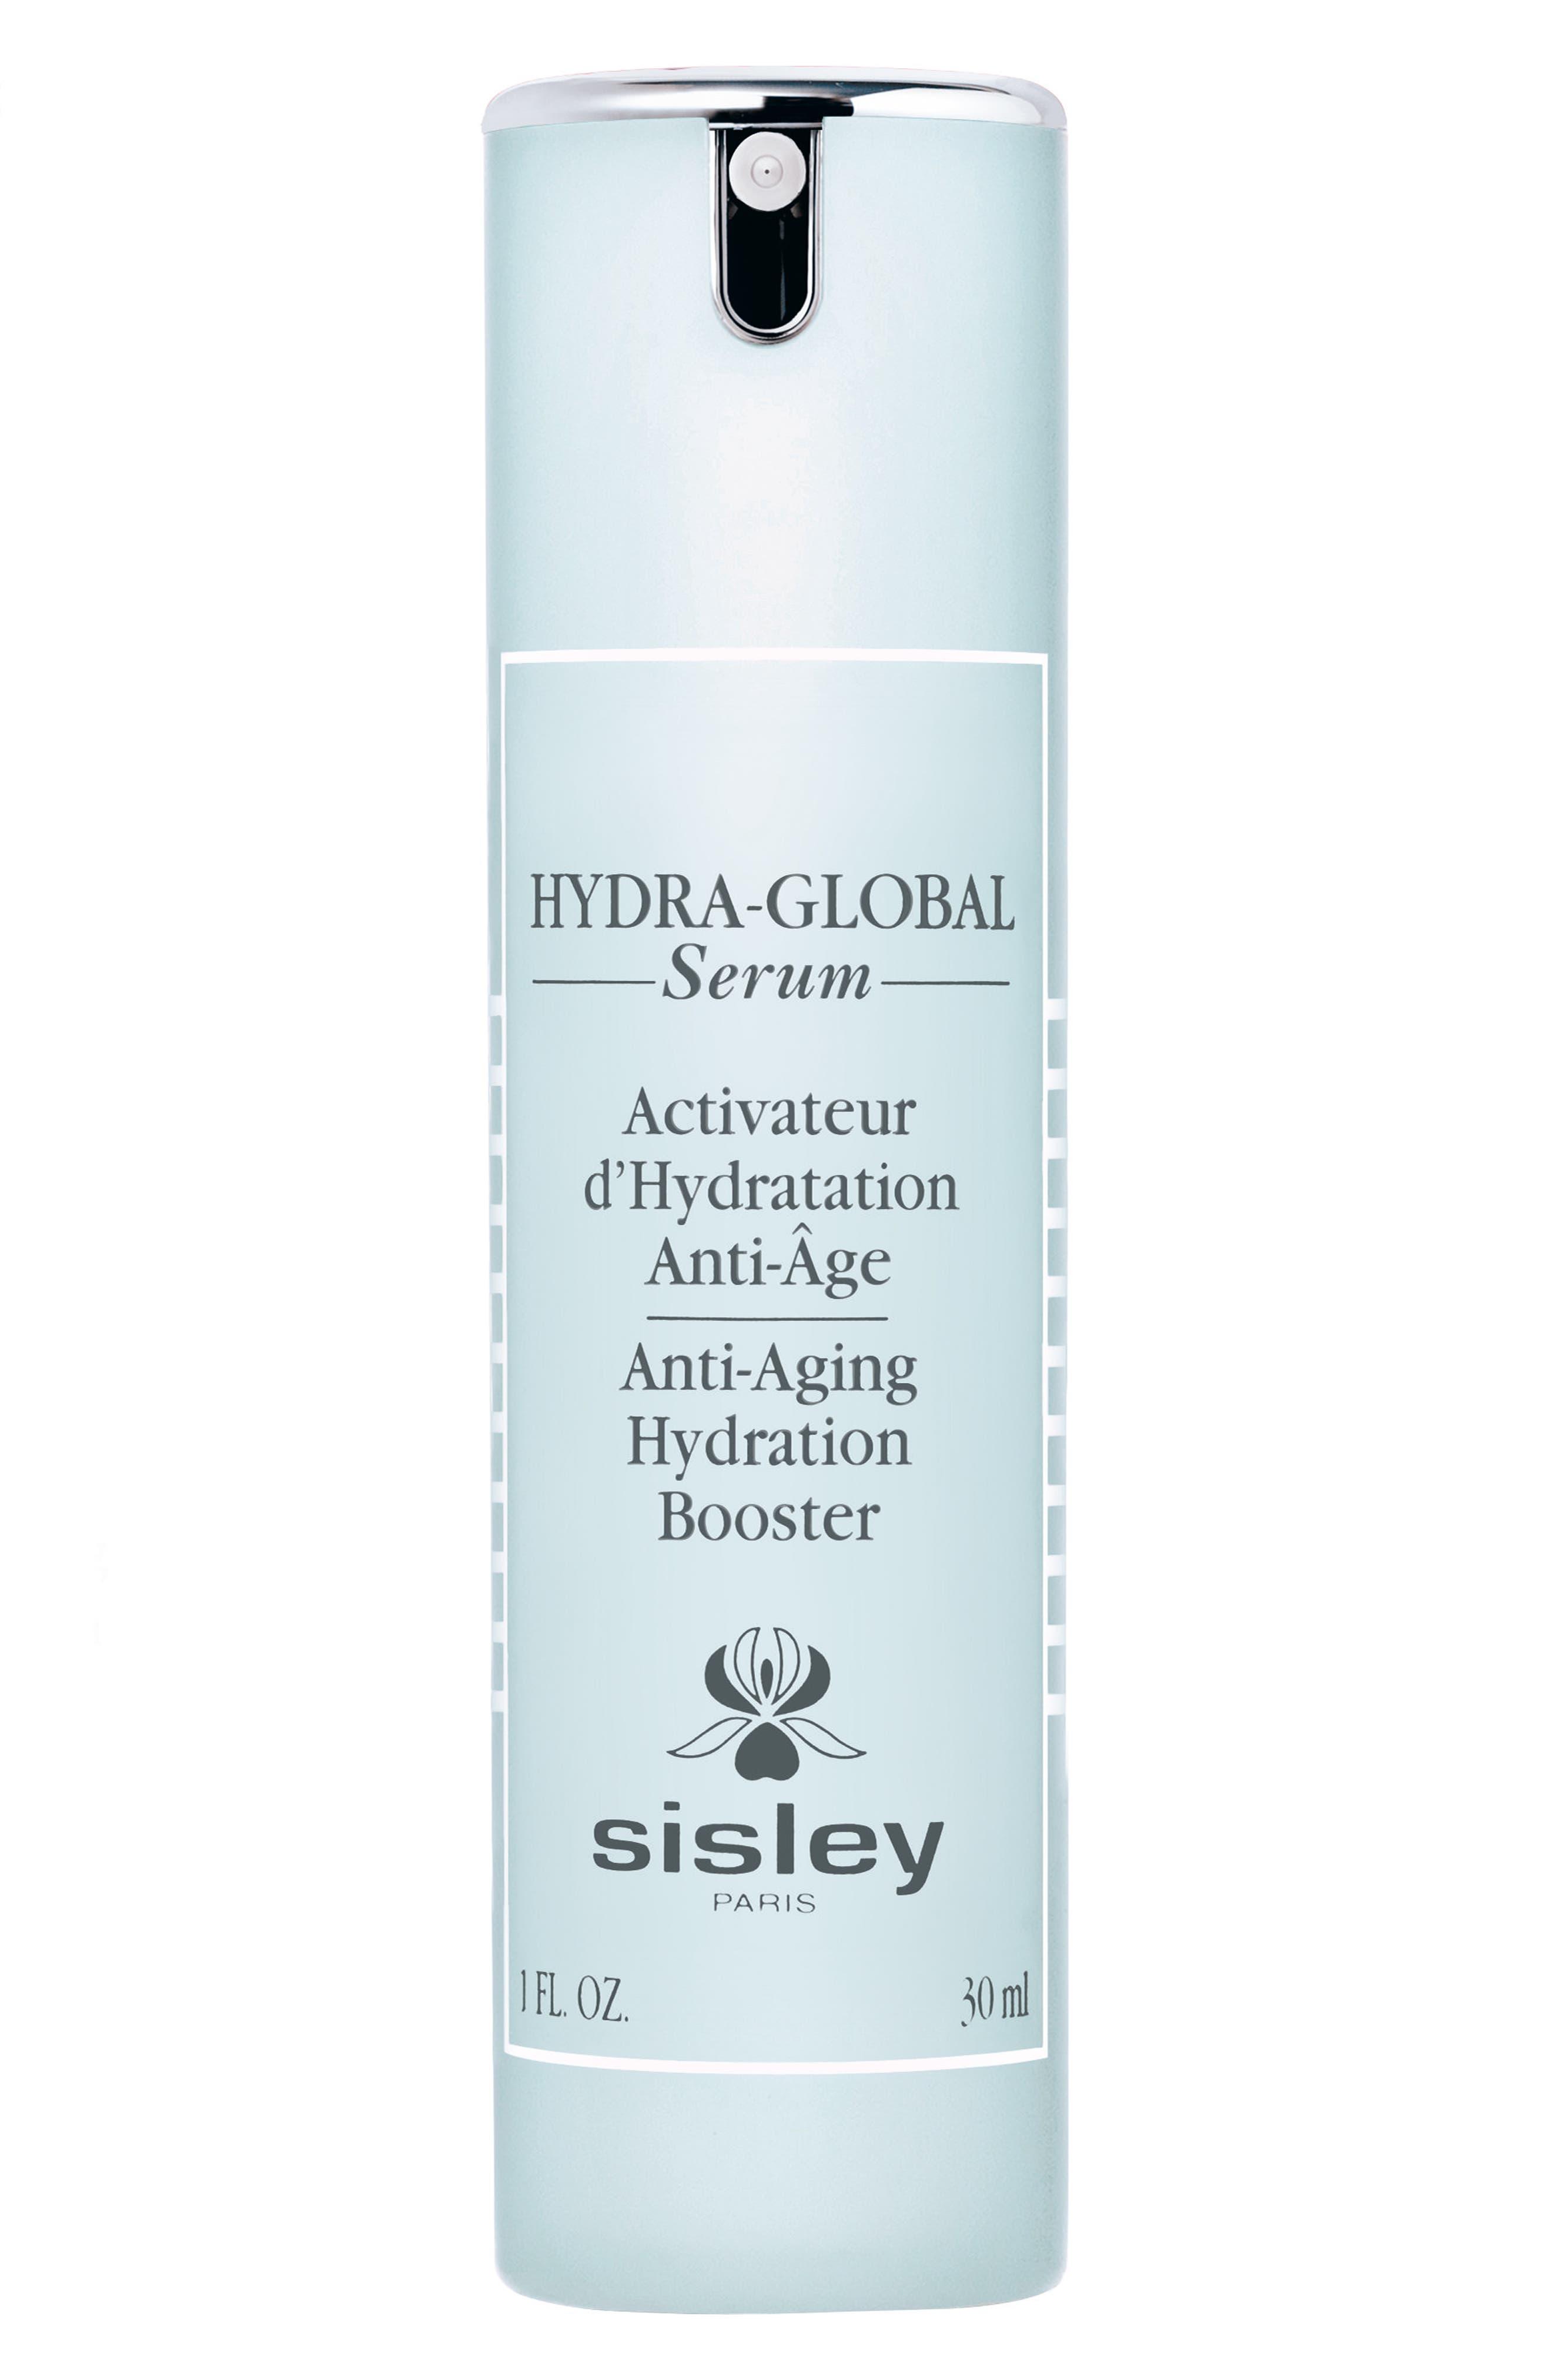 Sisley Paris Hydra-Global Serum Anti-Aging Hydration Booster